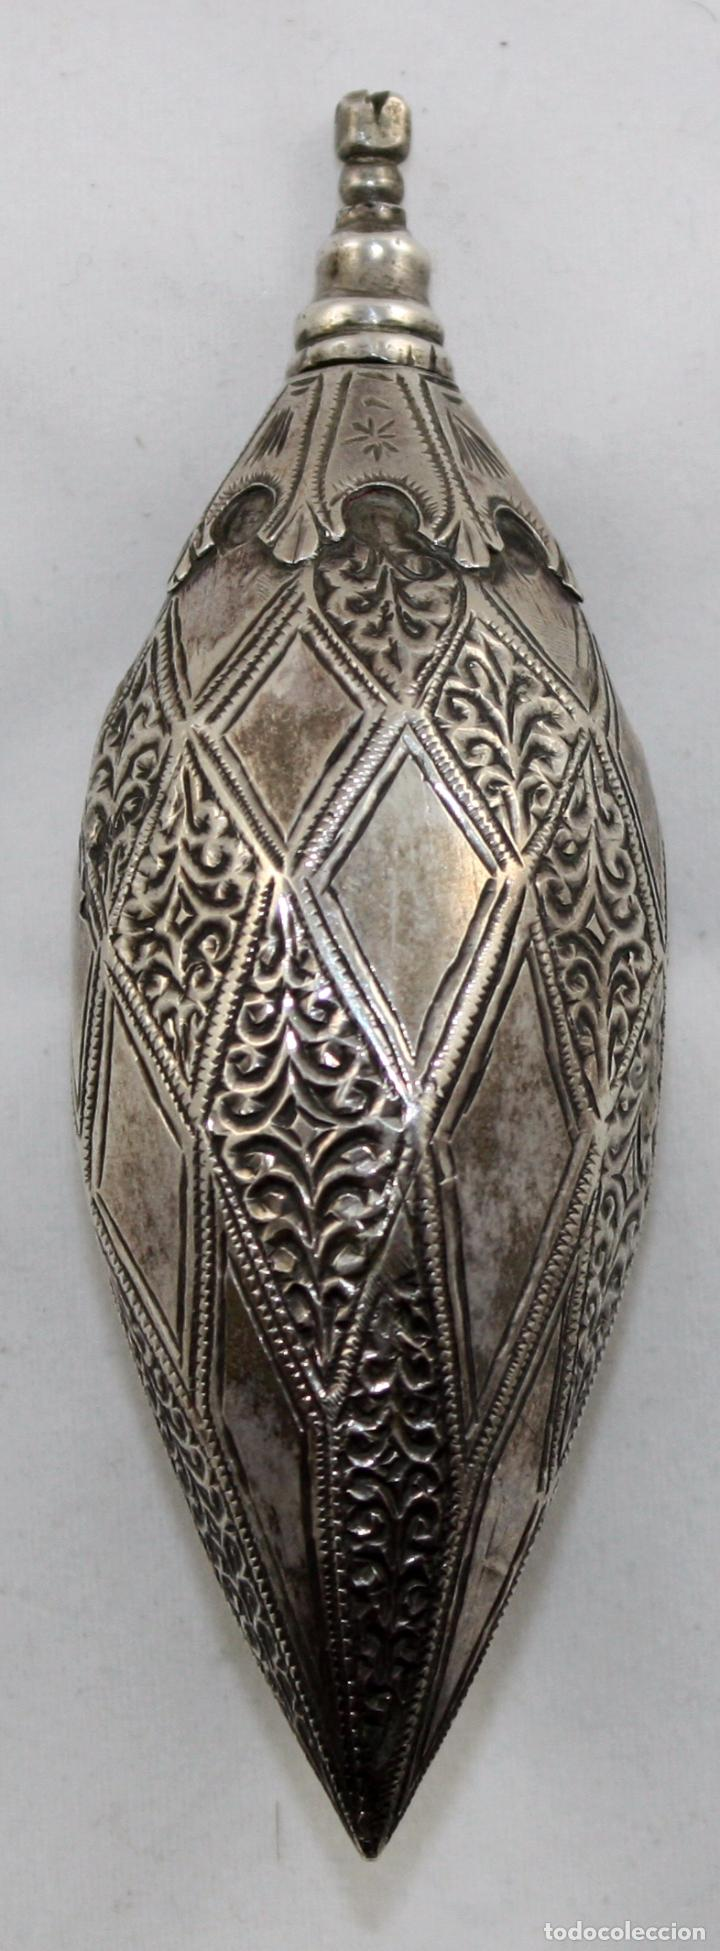 Antigüedades: PERFUMERO ORIENTALISTA EN PLATA DEL SIGLO XIX - Foto 6 - 100898631